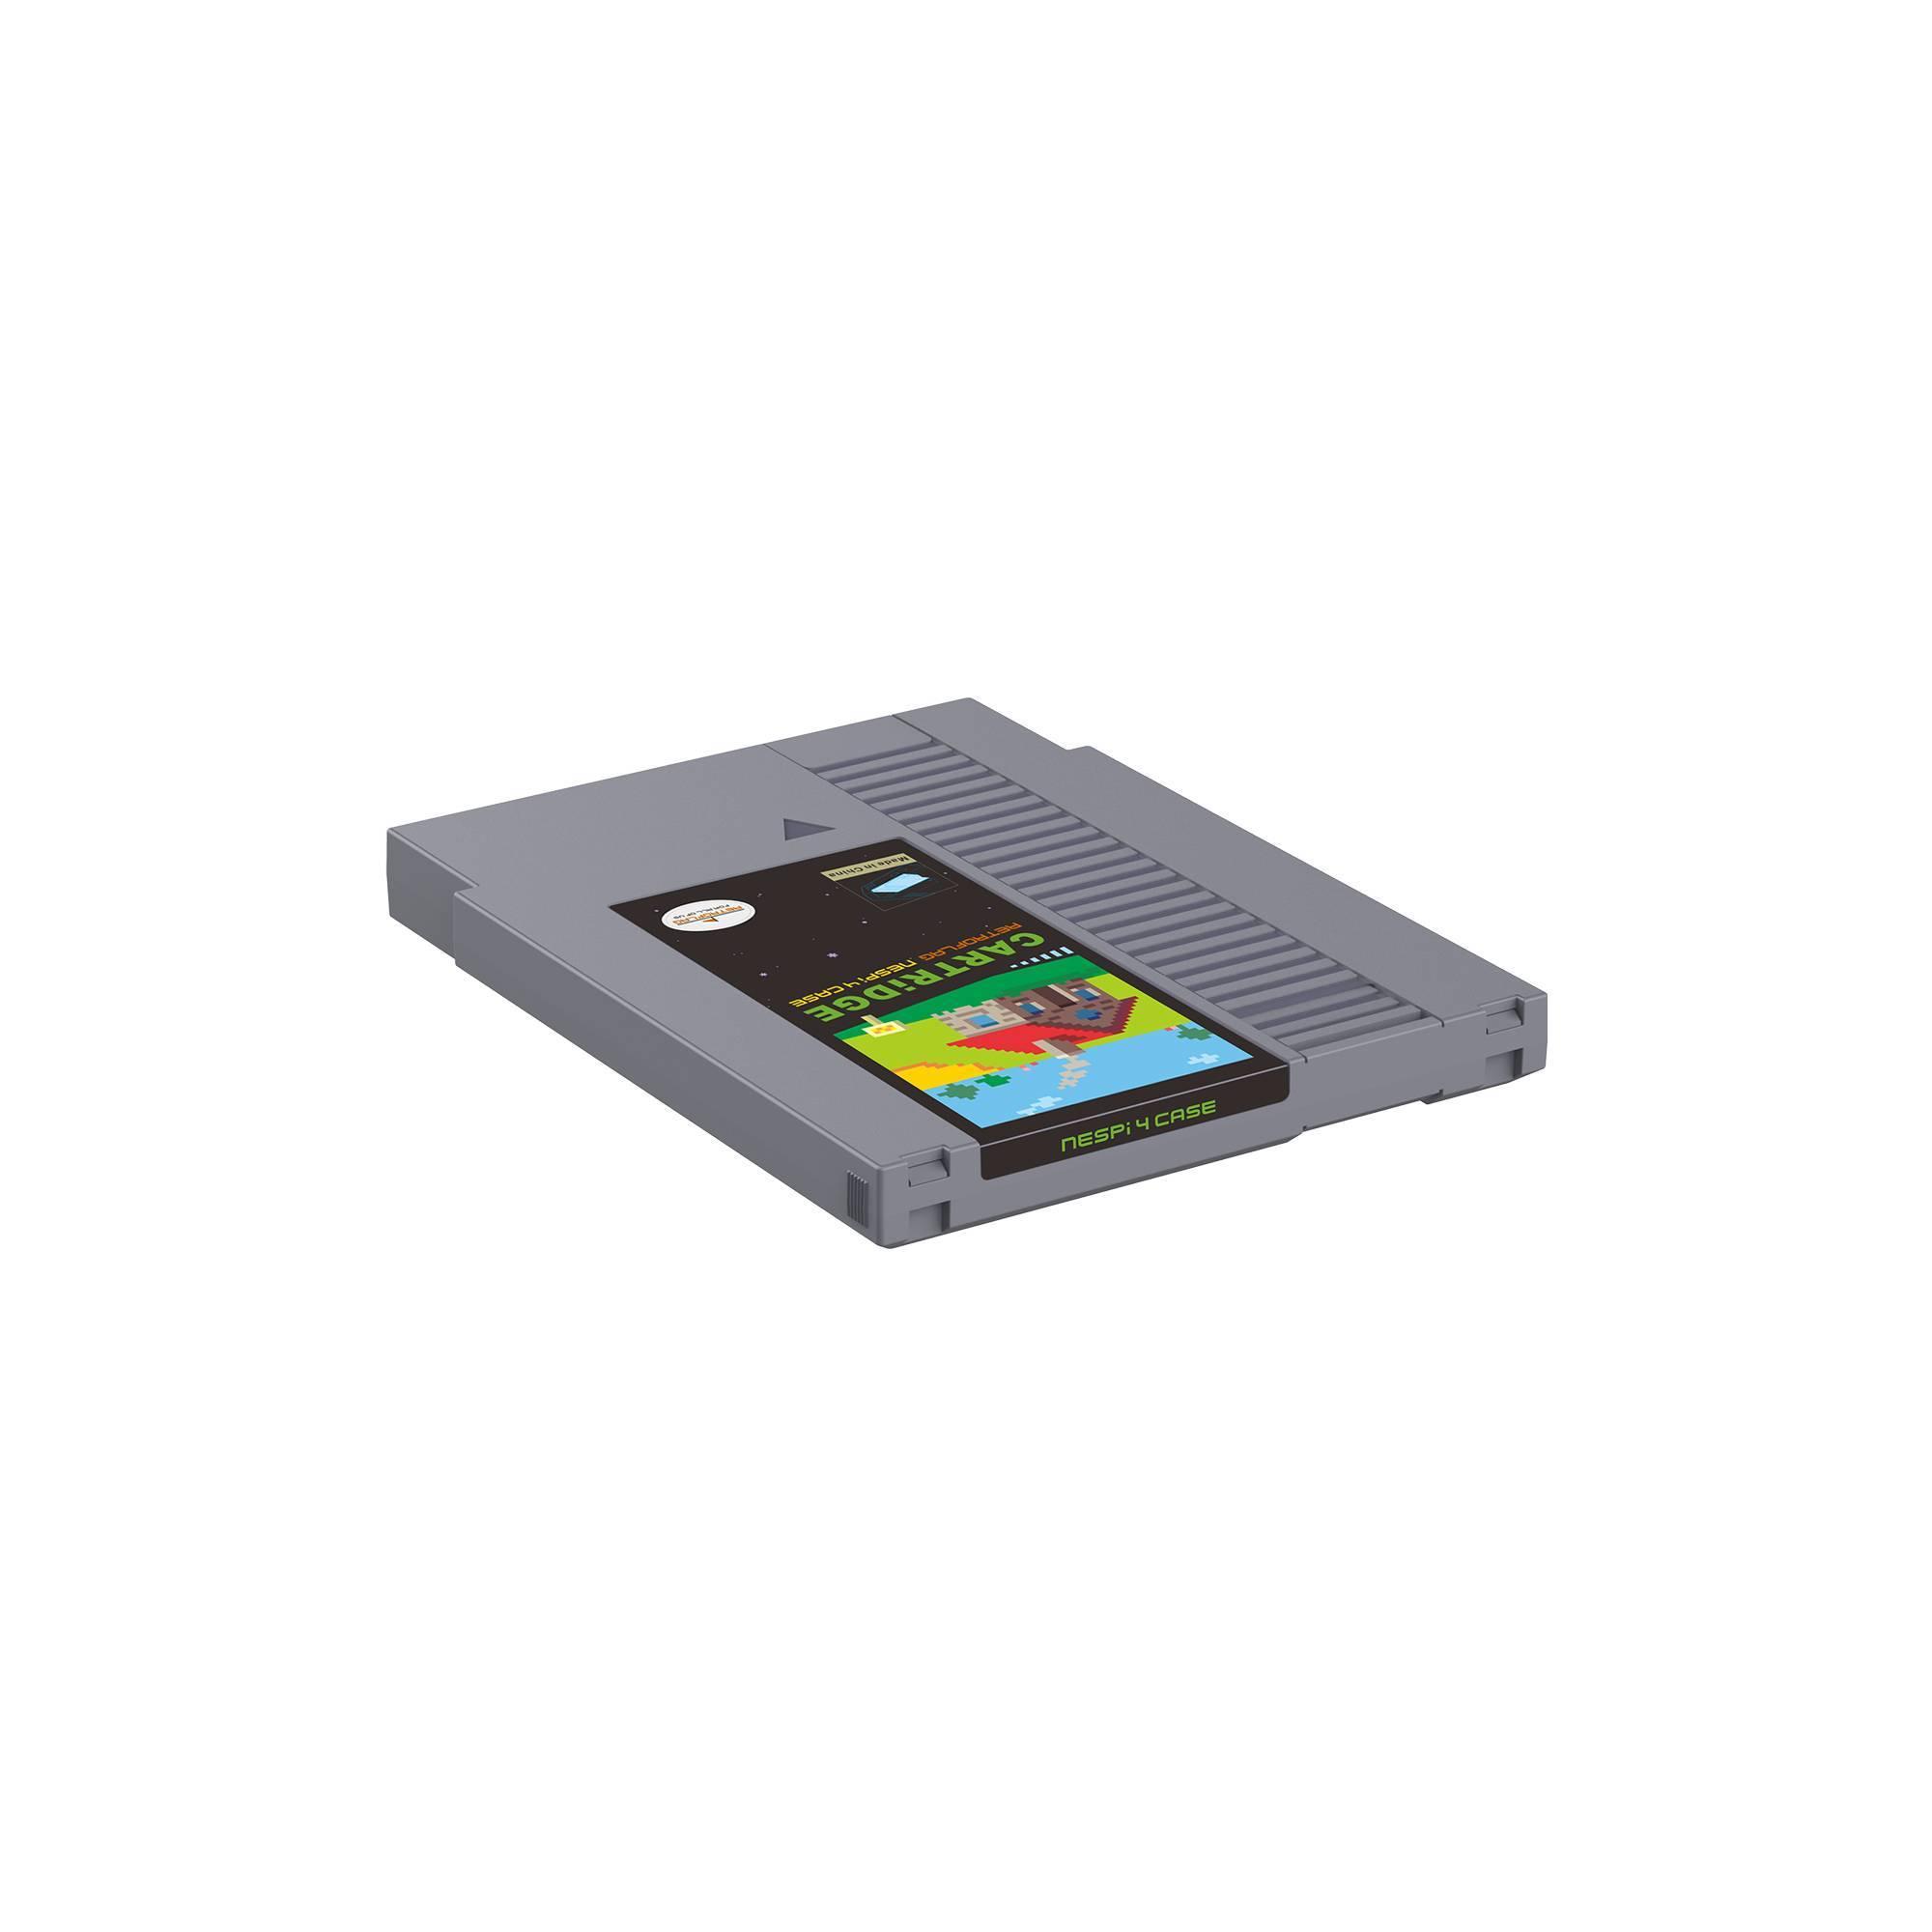 "RETROFLAG NESPi 4 DIY Starting Kit for RetroPie Home Console - Showing the NESPi 4 2.5"" HDD/SSD Adaptor"